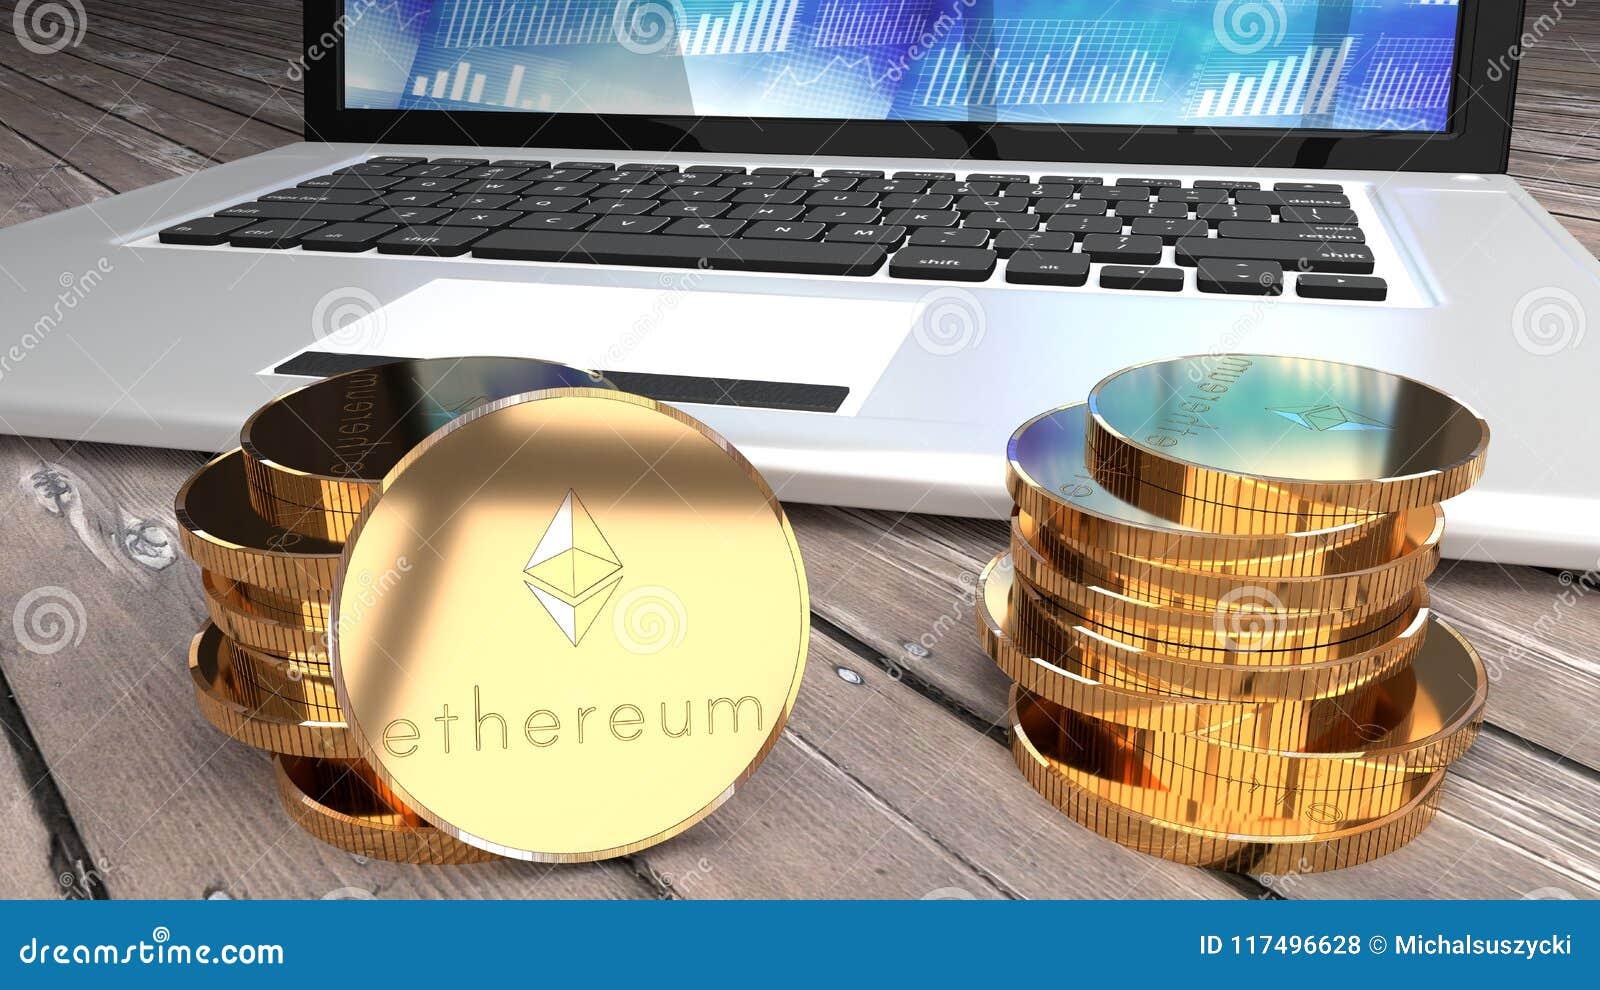 ethereum bitcoin alternative